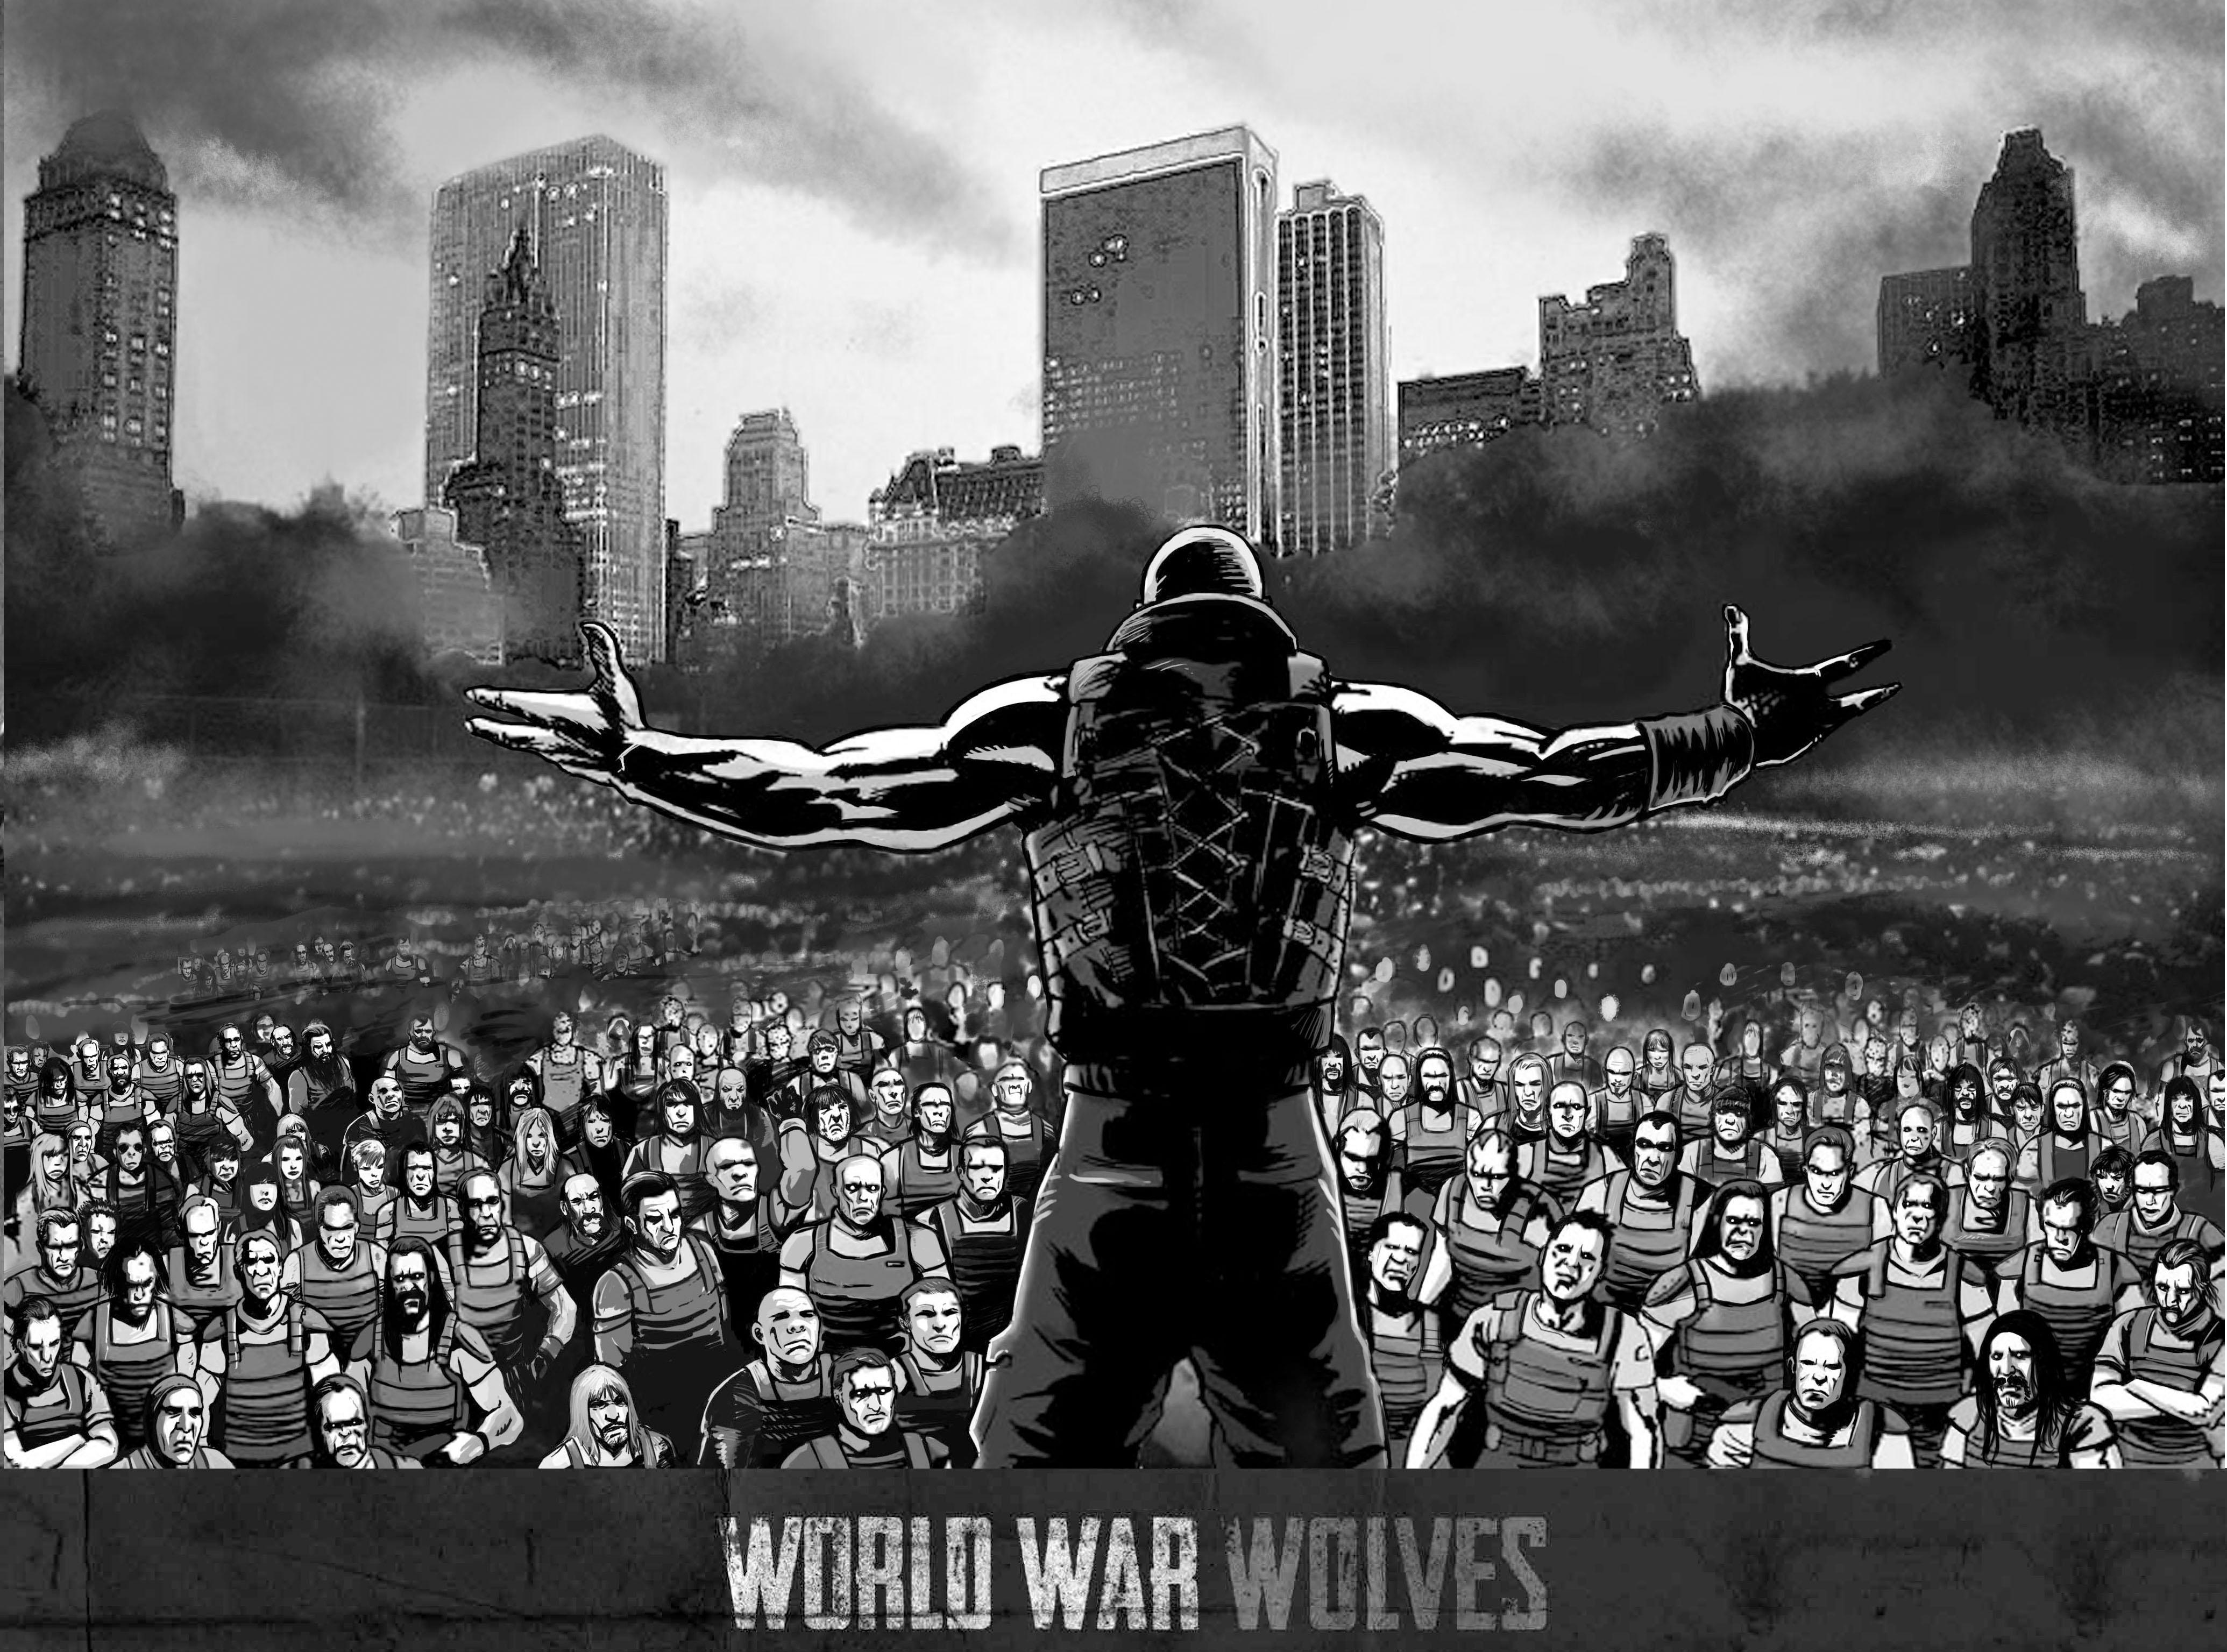 jean-luc istin world war wolves kyko duarte